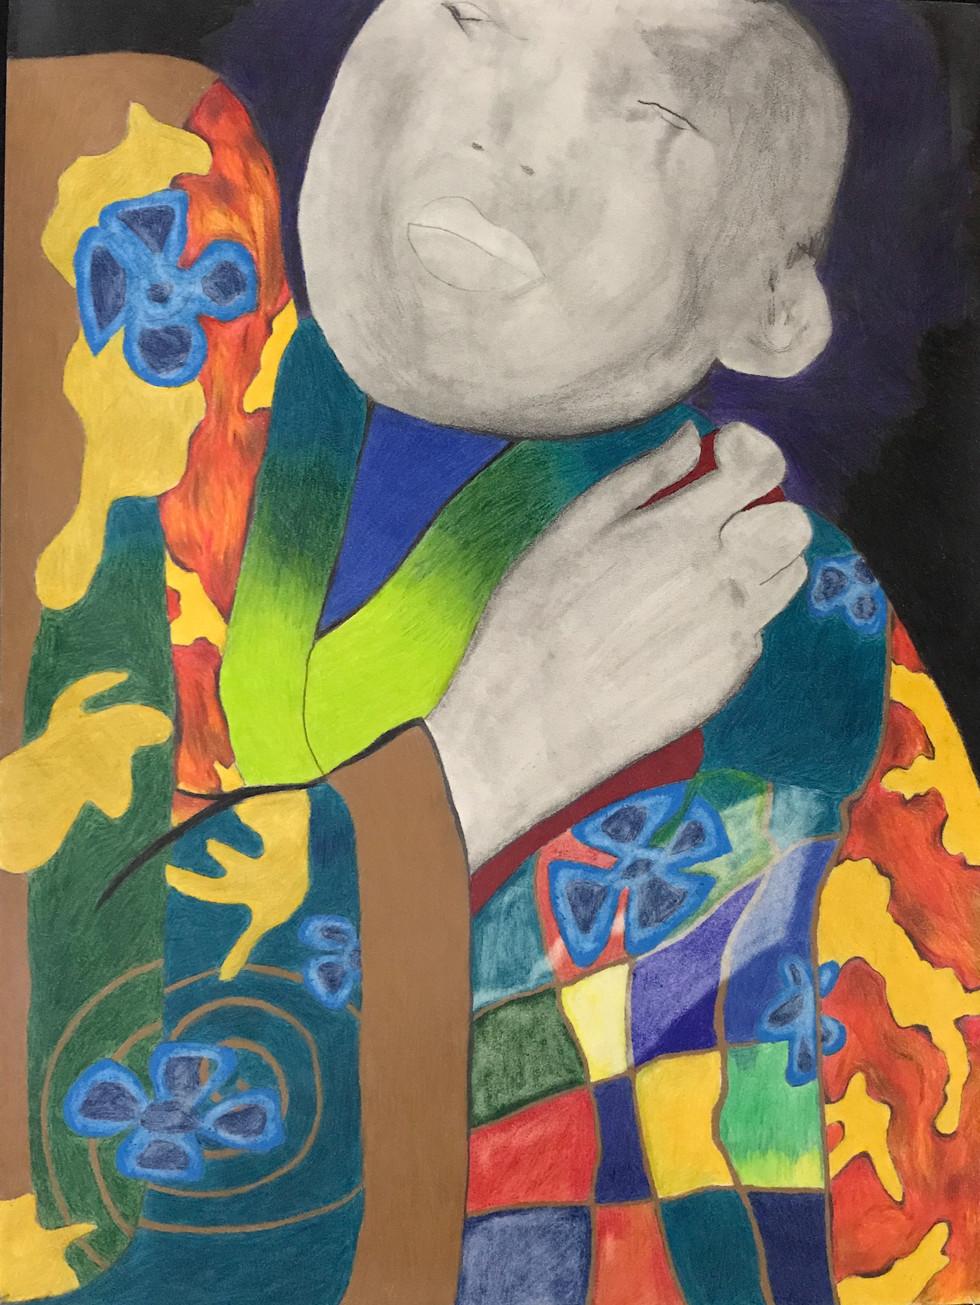 Demetri Fisher art - prolixis 4